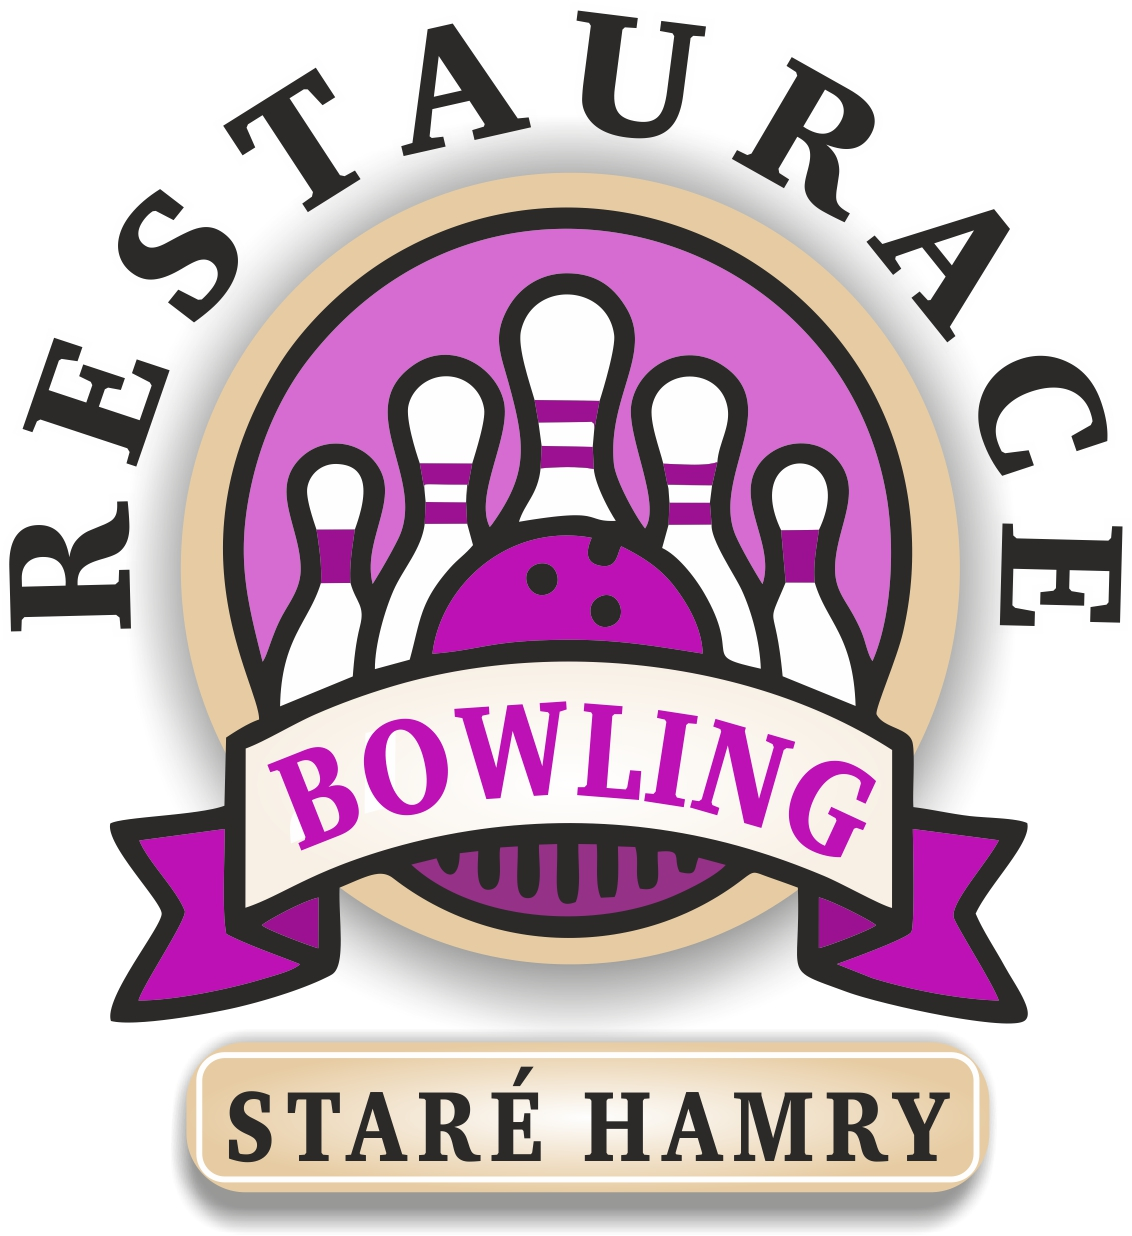 Restaurace & Bowling & Sauna Staré Hamry